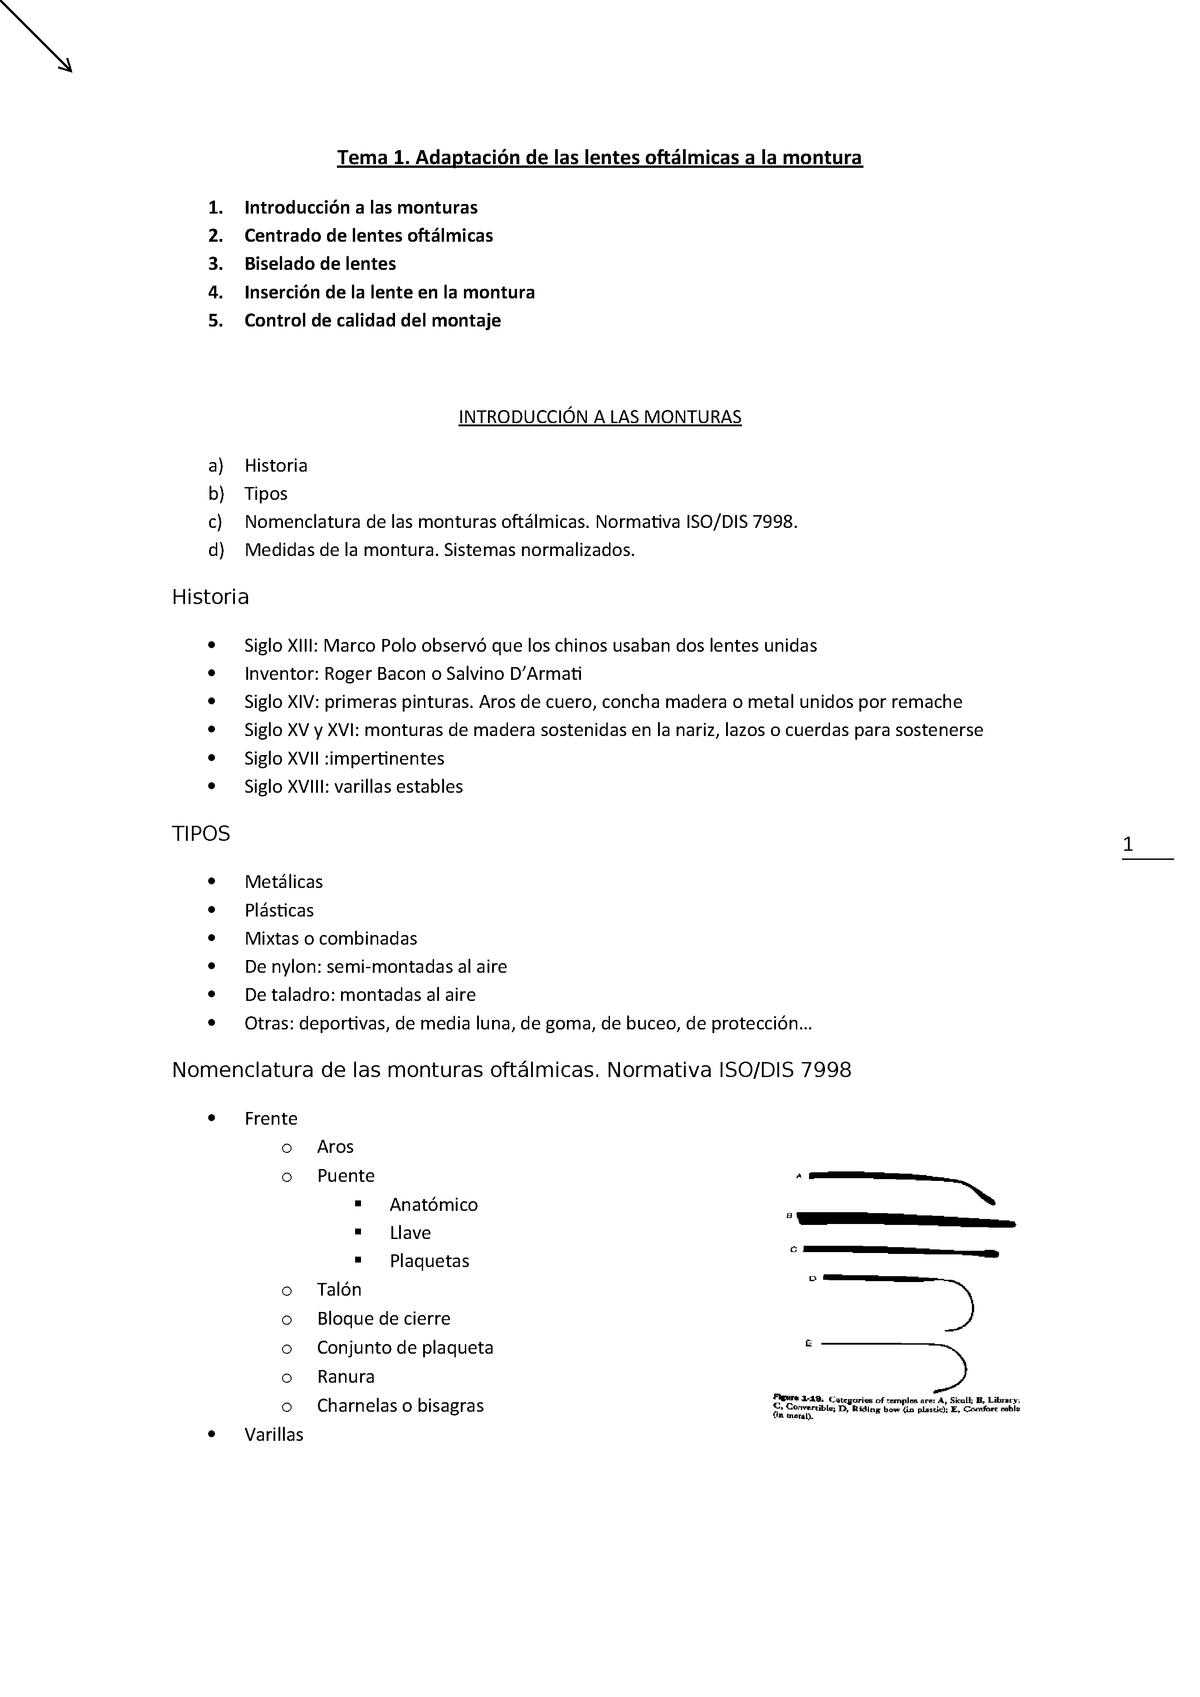 fbde3a505c Apuntes Adaptación de Lentes Oftálmicas. 46006. Completos - 46006:  Adaptación De Lentes Oftálmicas - StuDocu